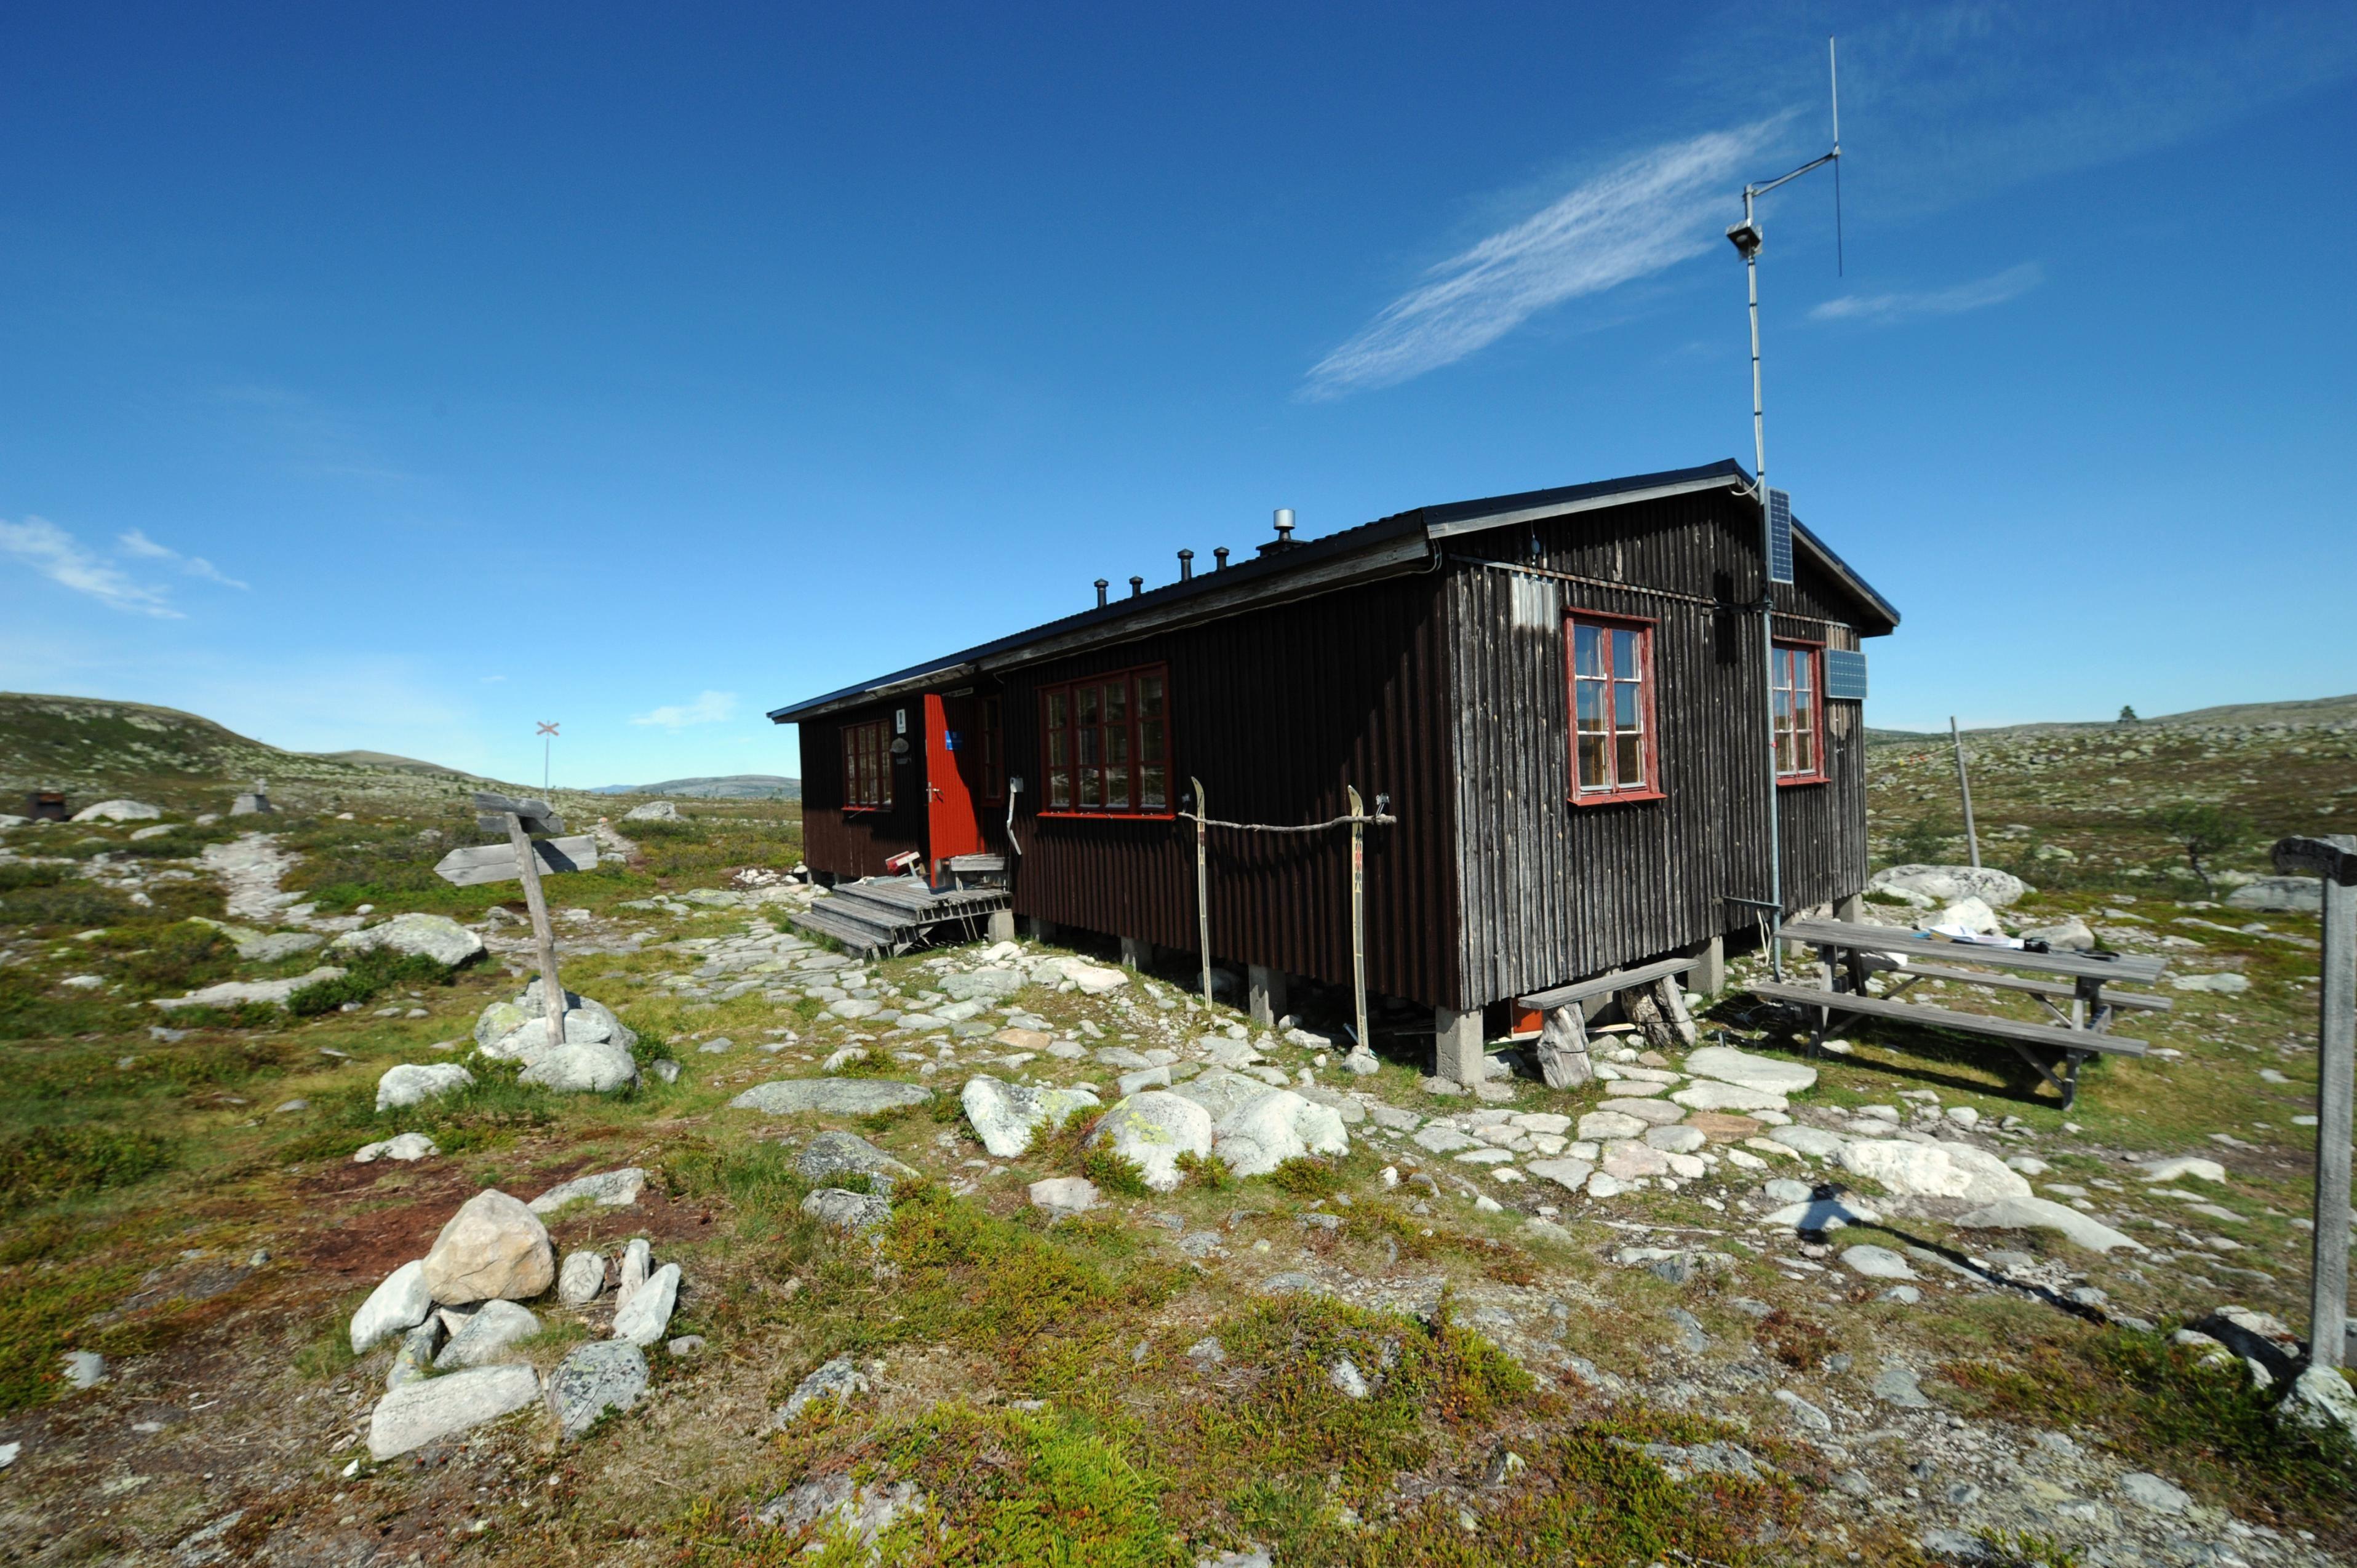 Nisse Schmidt, Storrödtjärns cabin